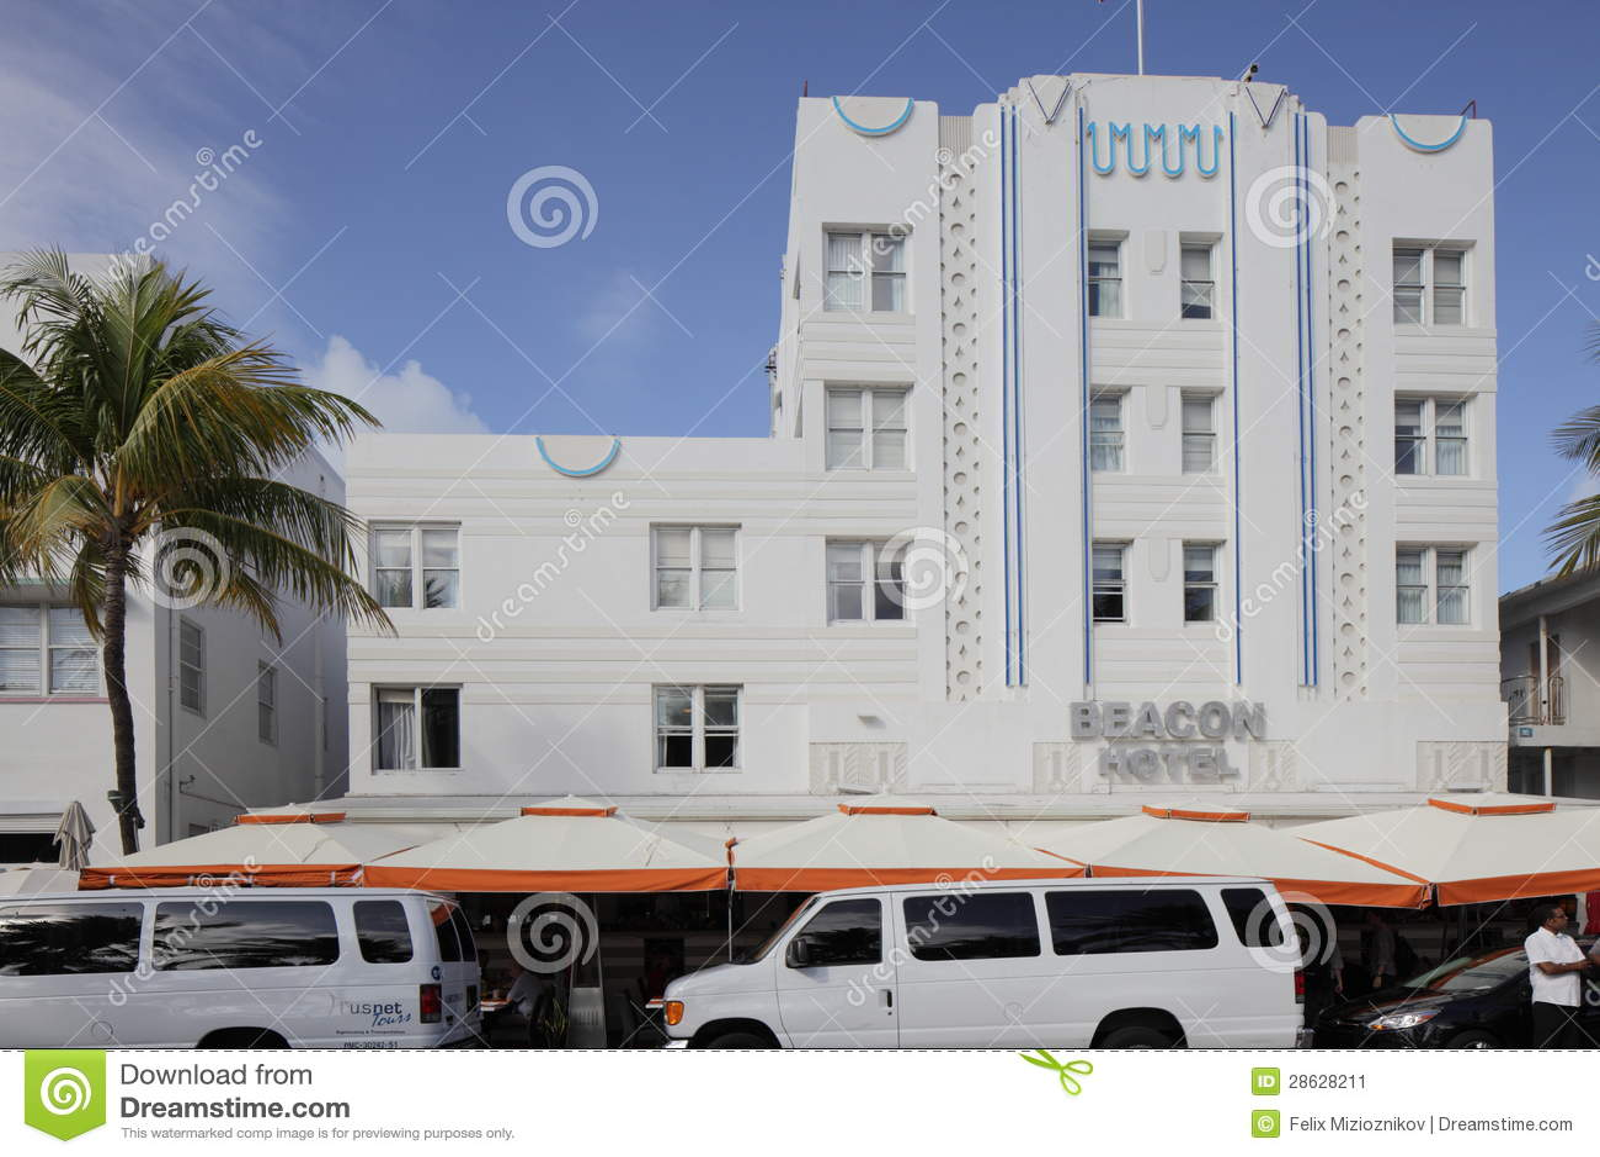 The Beacon & Railway Hotel - room photo 9124967